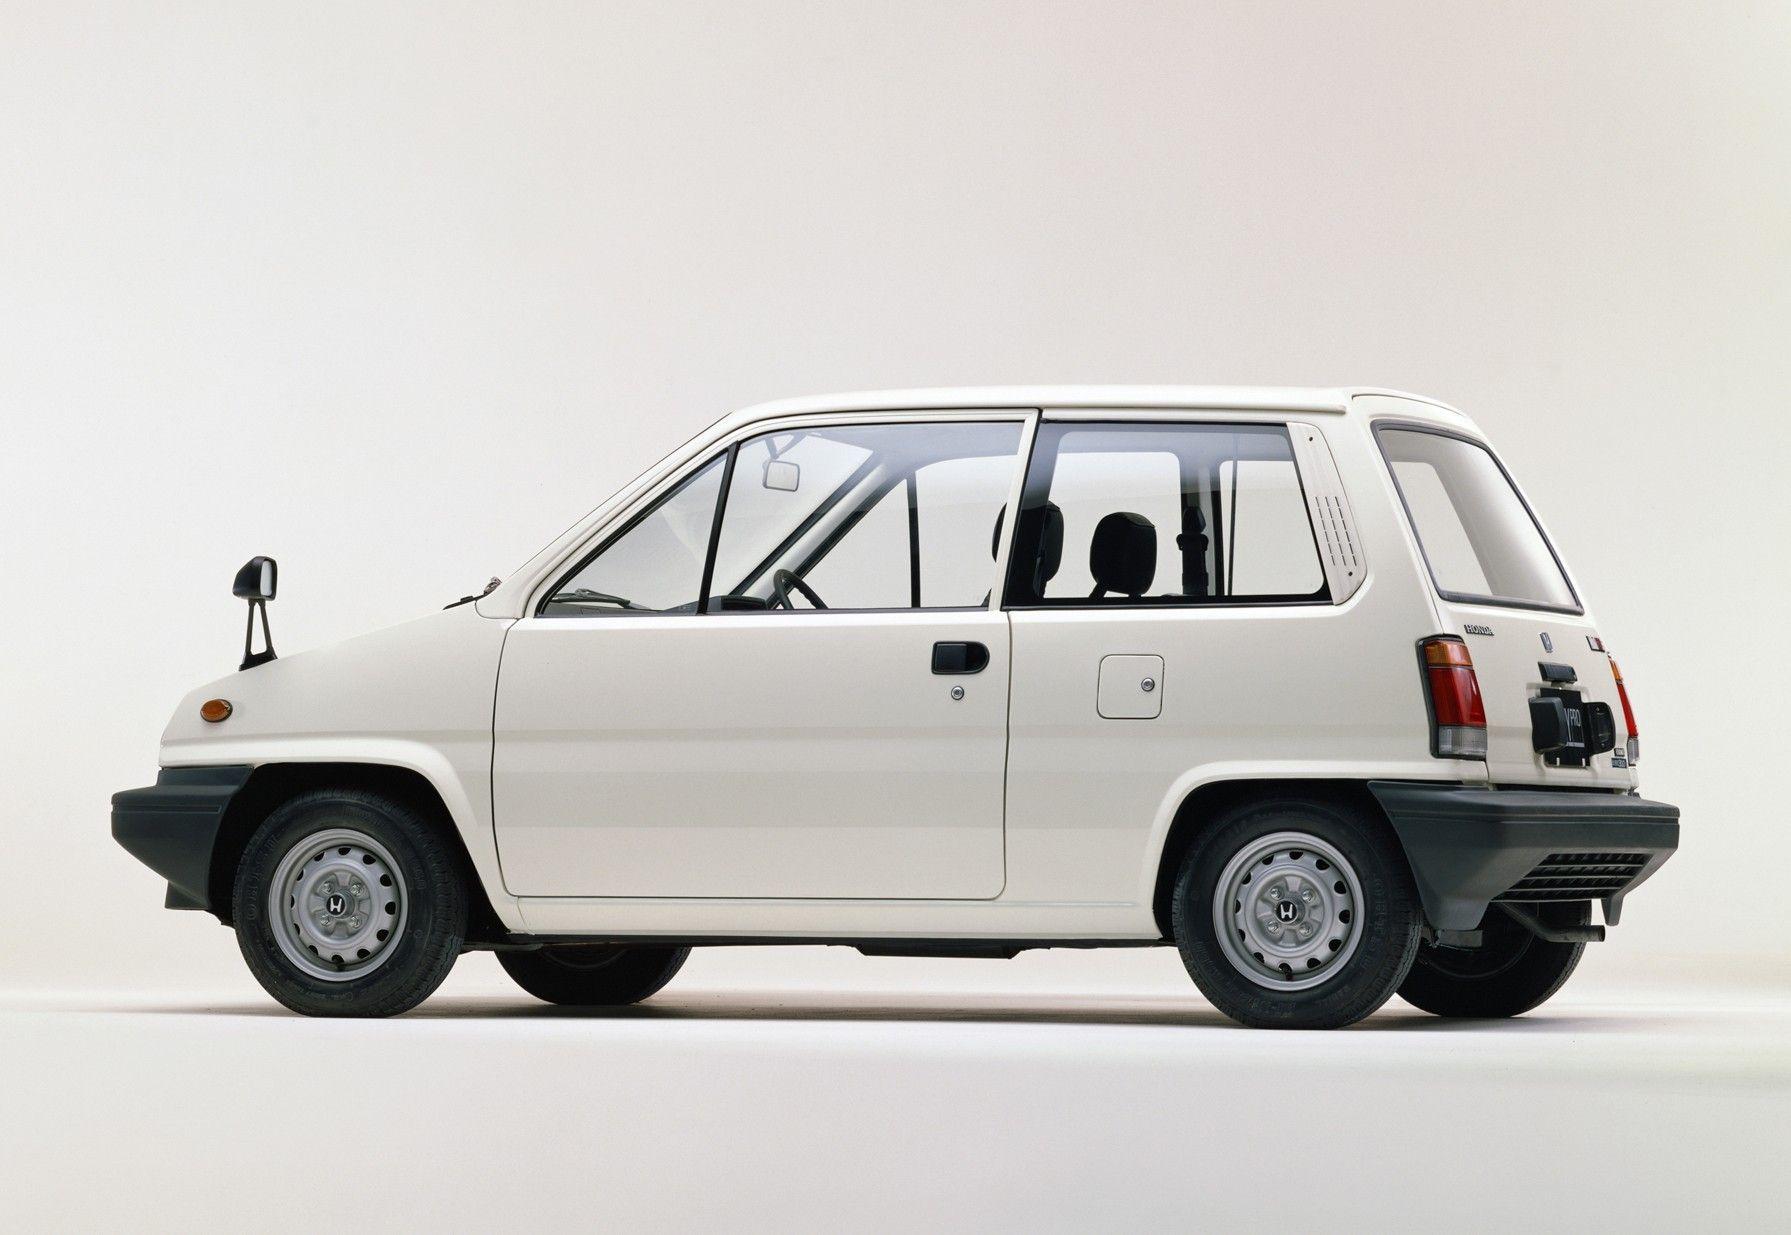 Honda City Pro F (VF) '11.1981-03.1984   ホンダ, 乗り物, 車